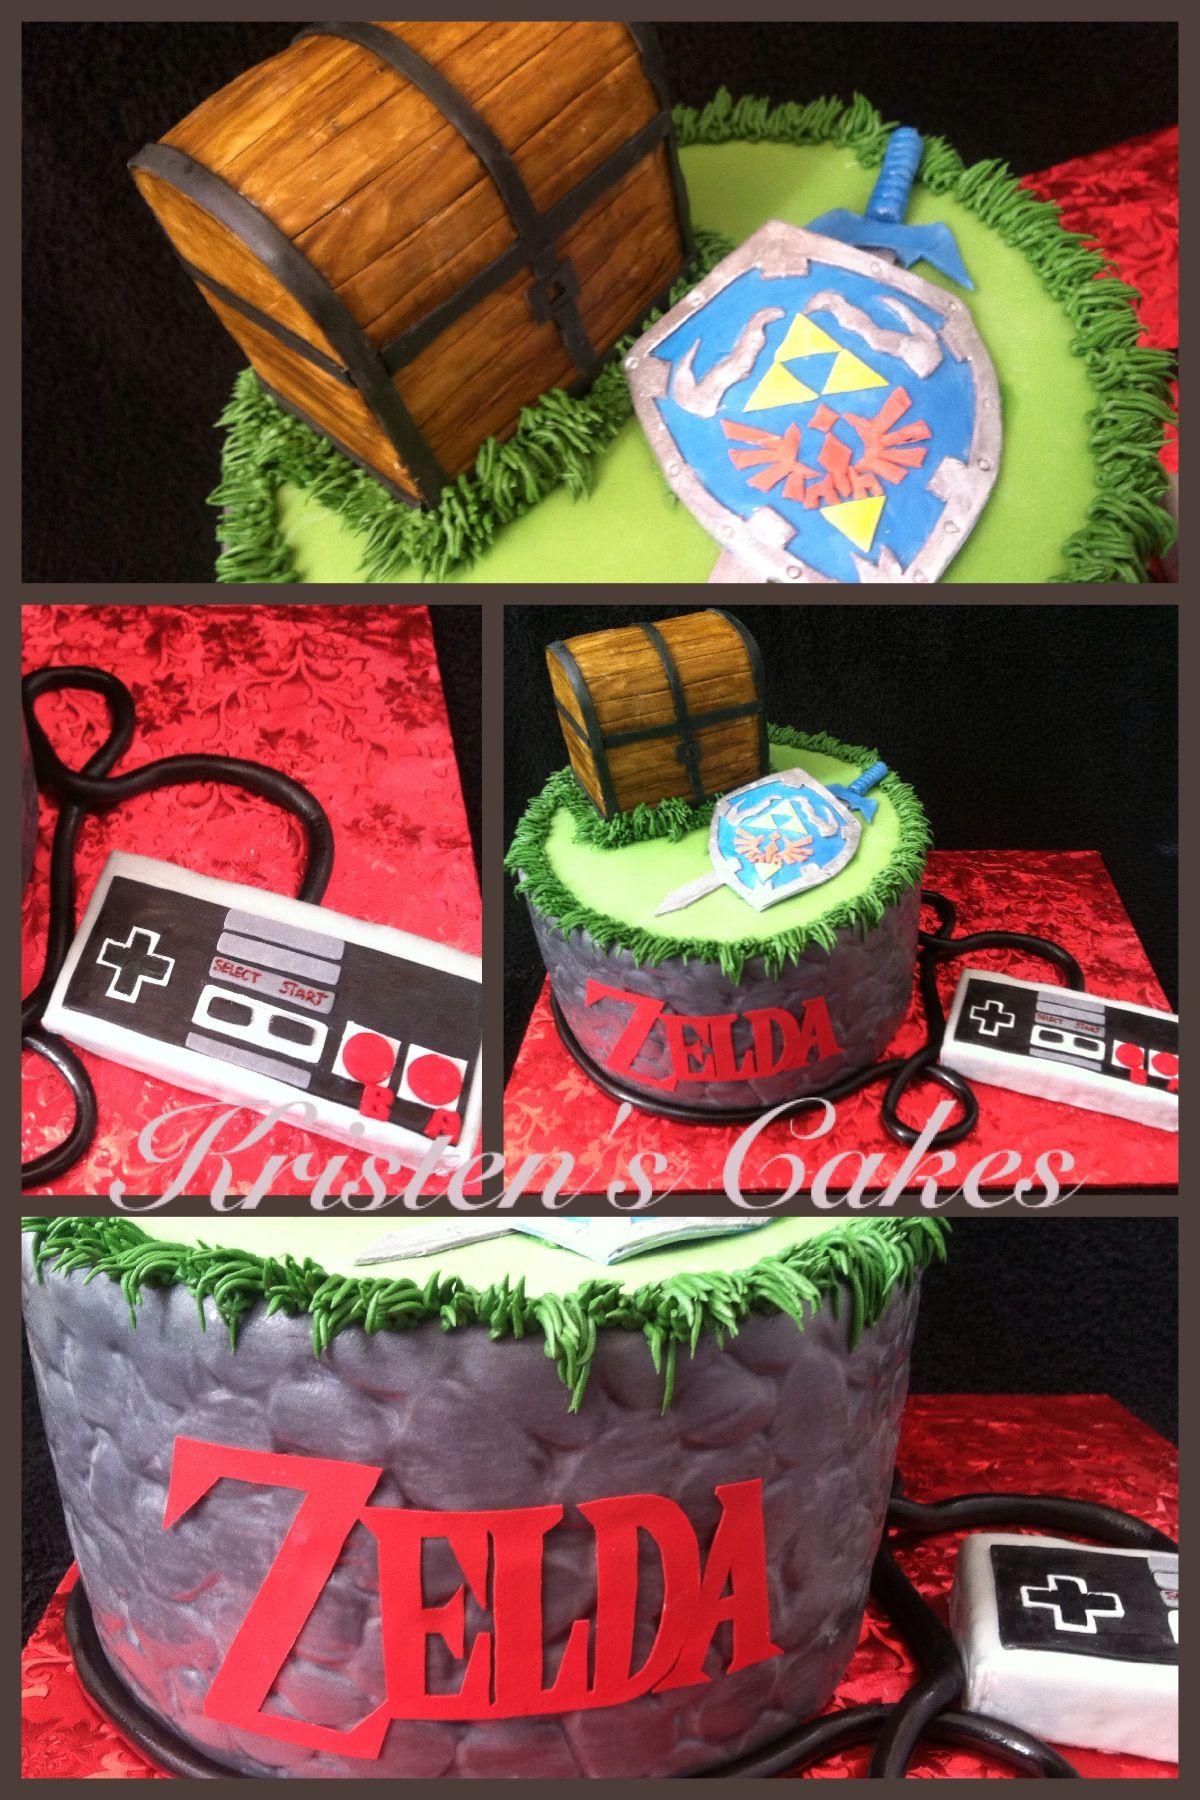 Phenomenal Zelda Cake Extravaganza With Images Zelda Cake Zelda Funny Birthday Cards Online Elaedamsfinfo